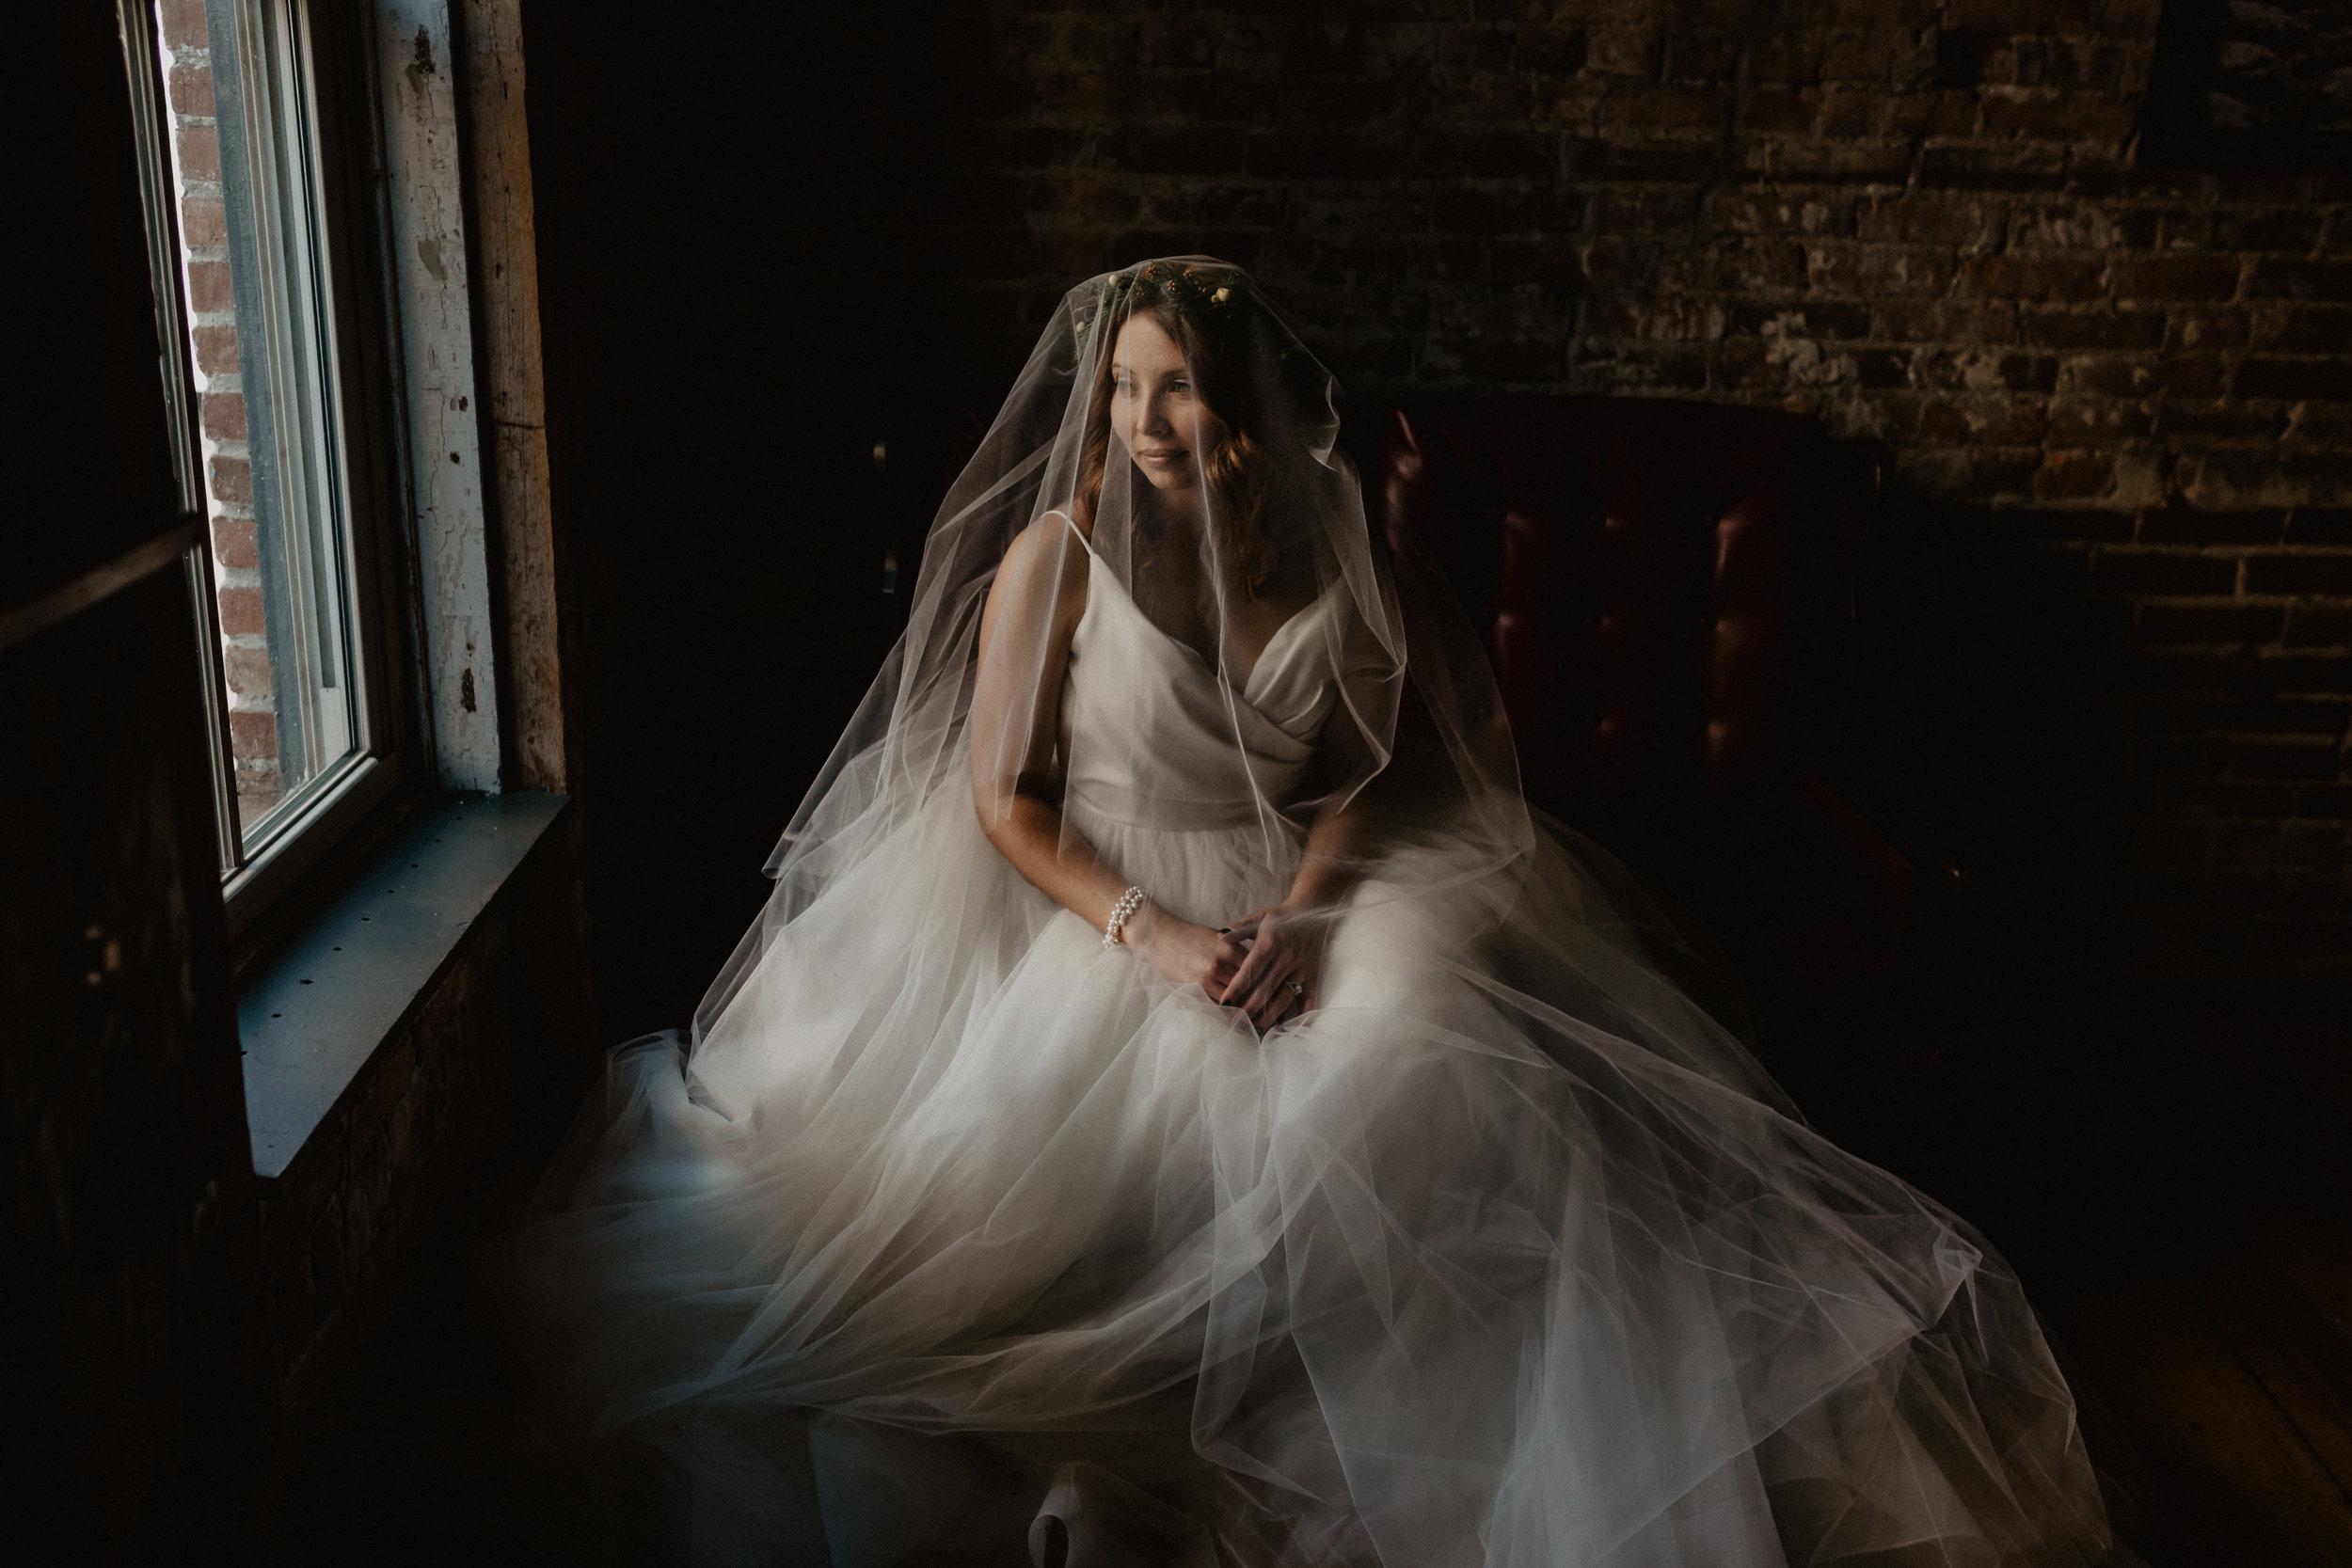 lucas_confectionery_wedding-44.jpg